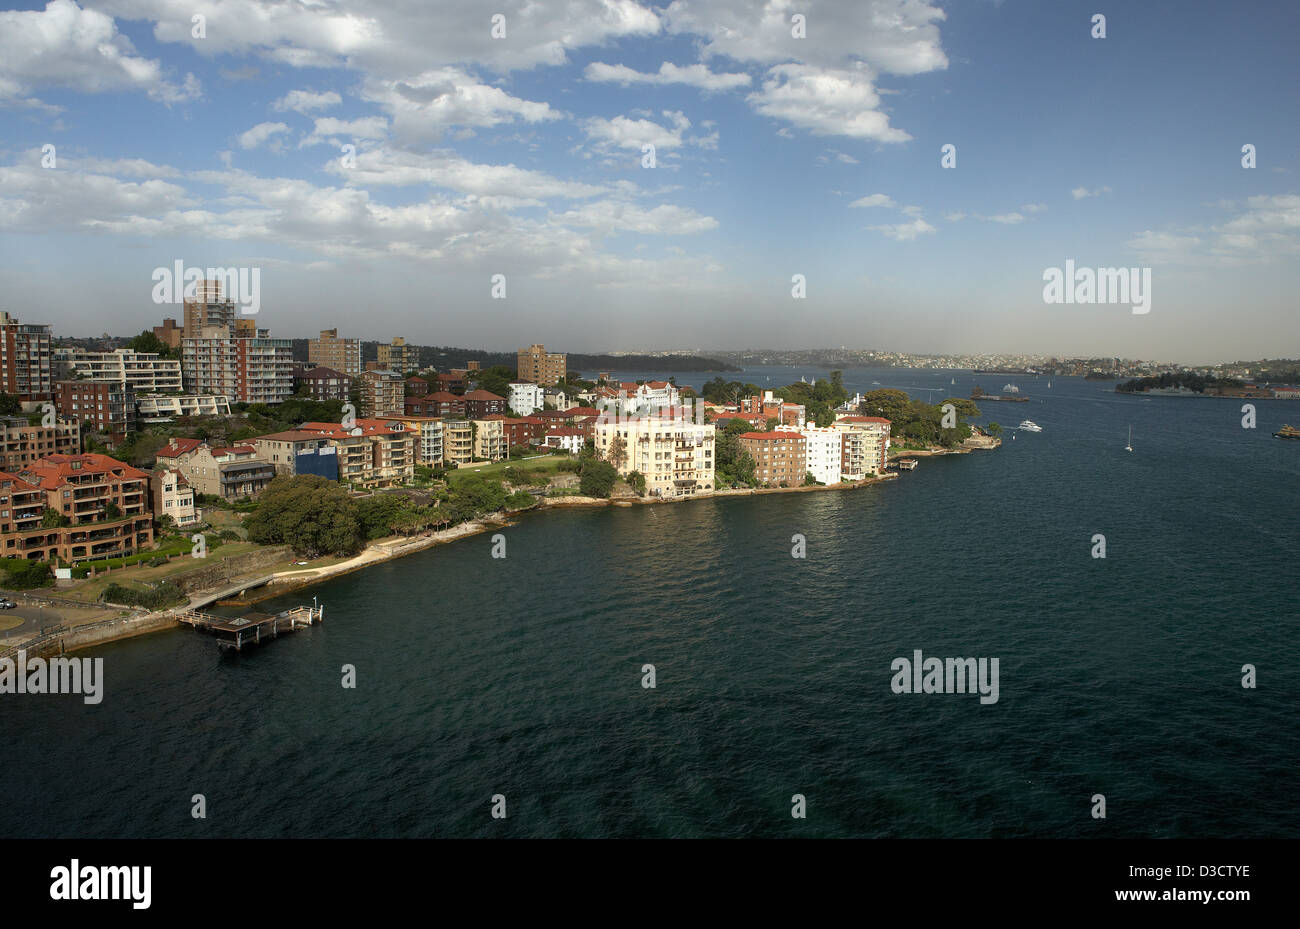 Sydney, Australia, the suburb of Kirribilli seen from the Harbour Bridge - Stock Image